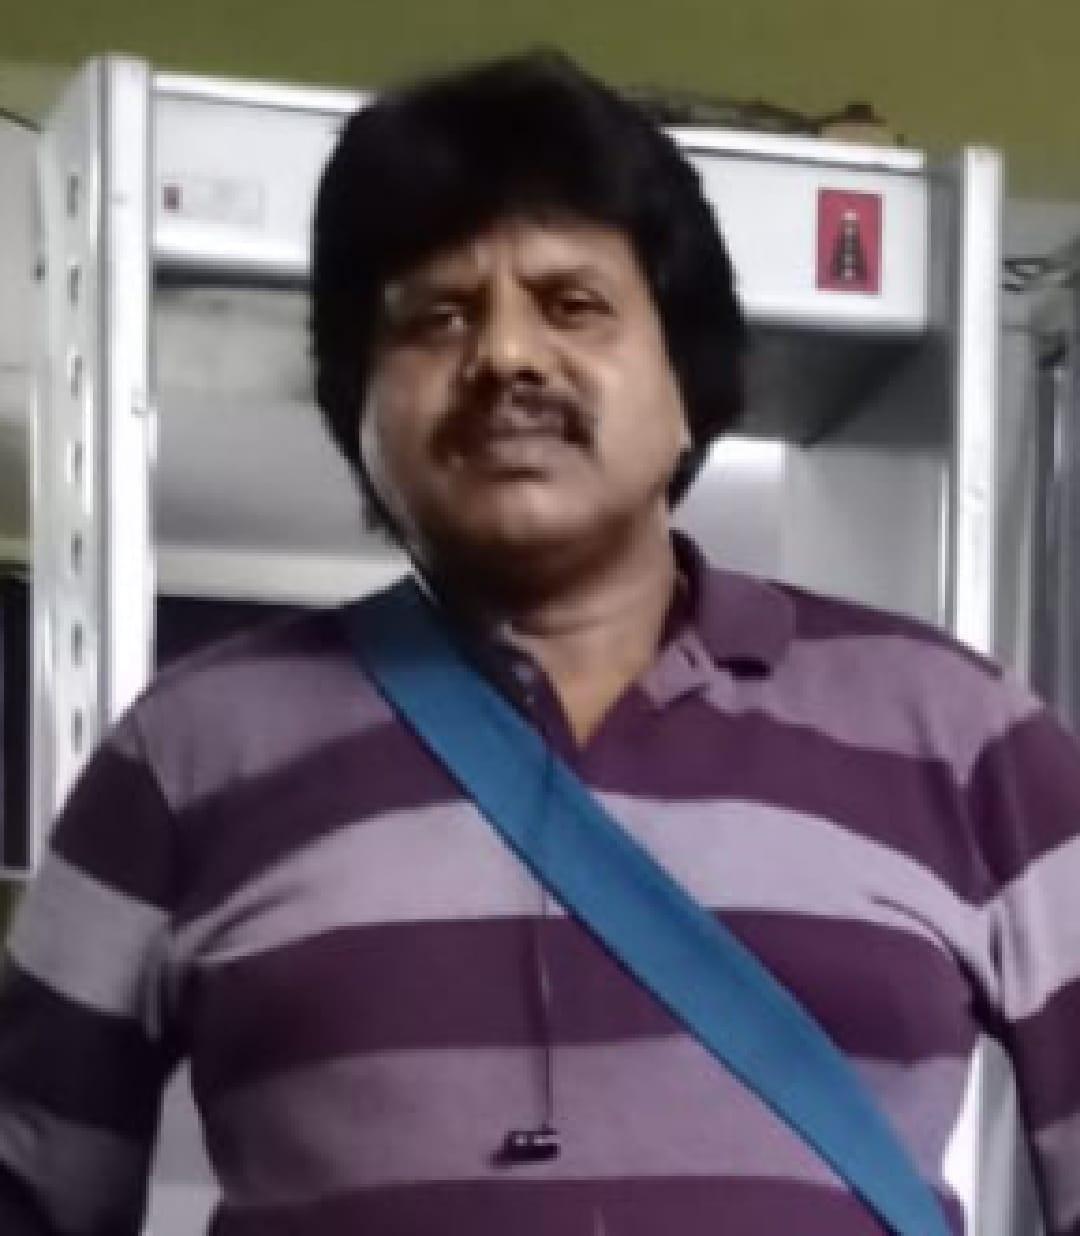 RJ Nadhan